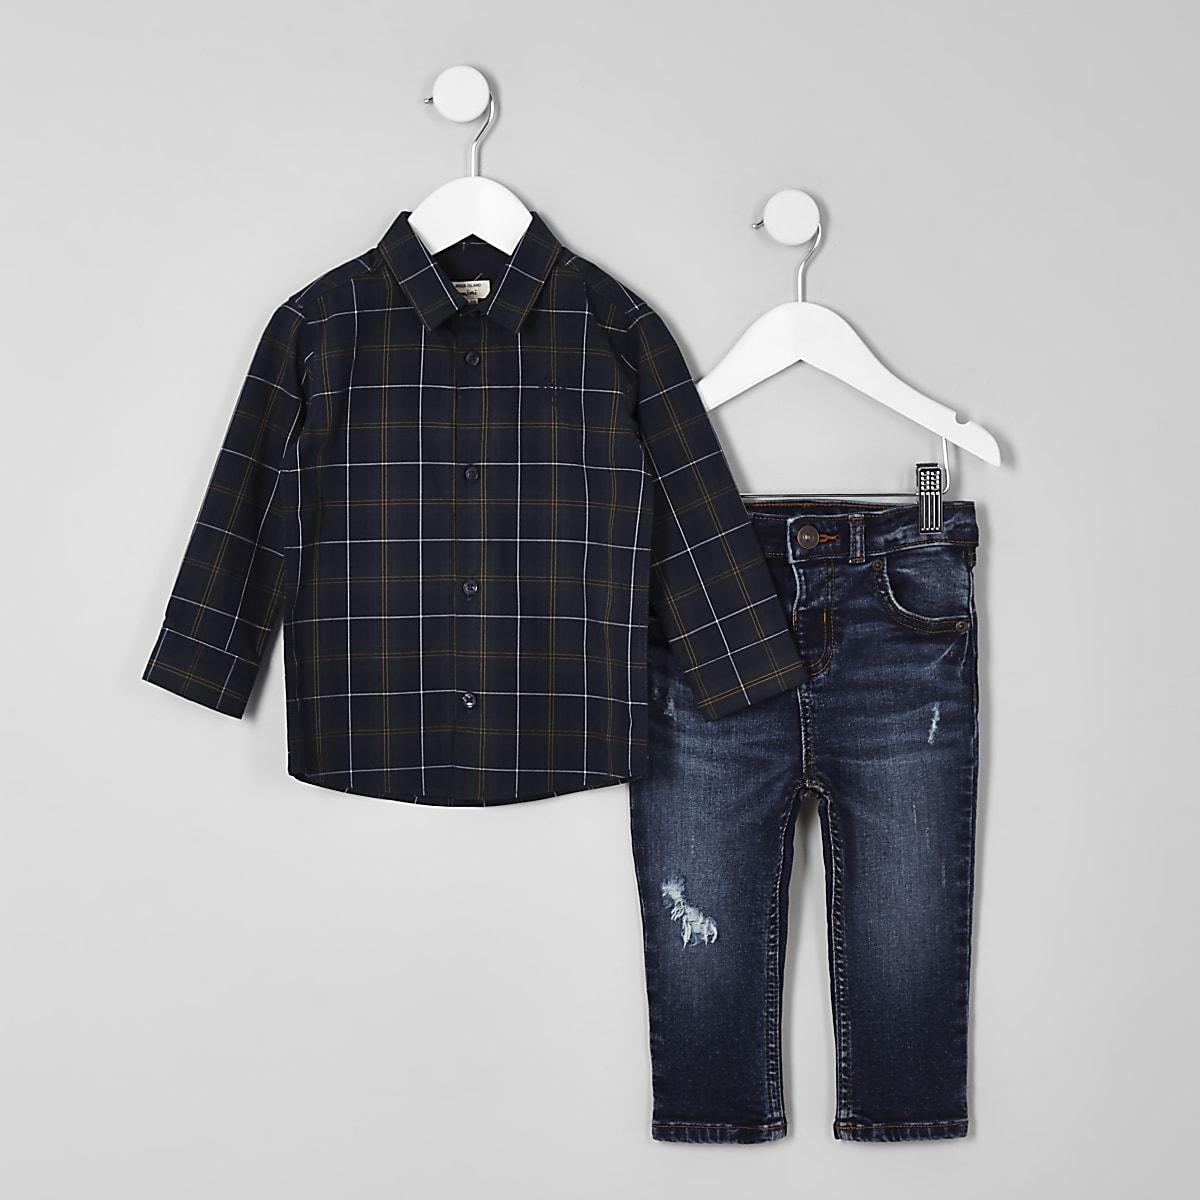 4e3792e8a Mini boys green check shirt and jeans outfit - Baby Boys Outfits - Mini Boys  - boys